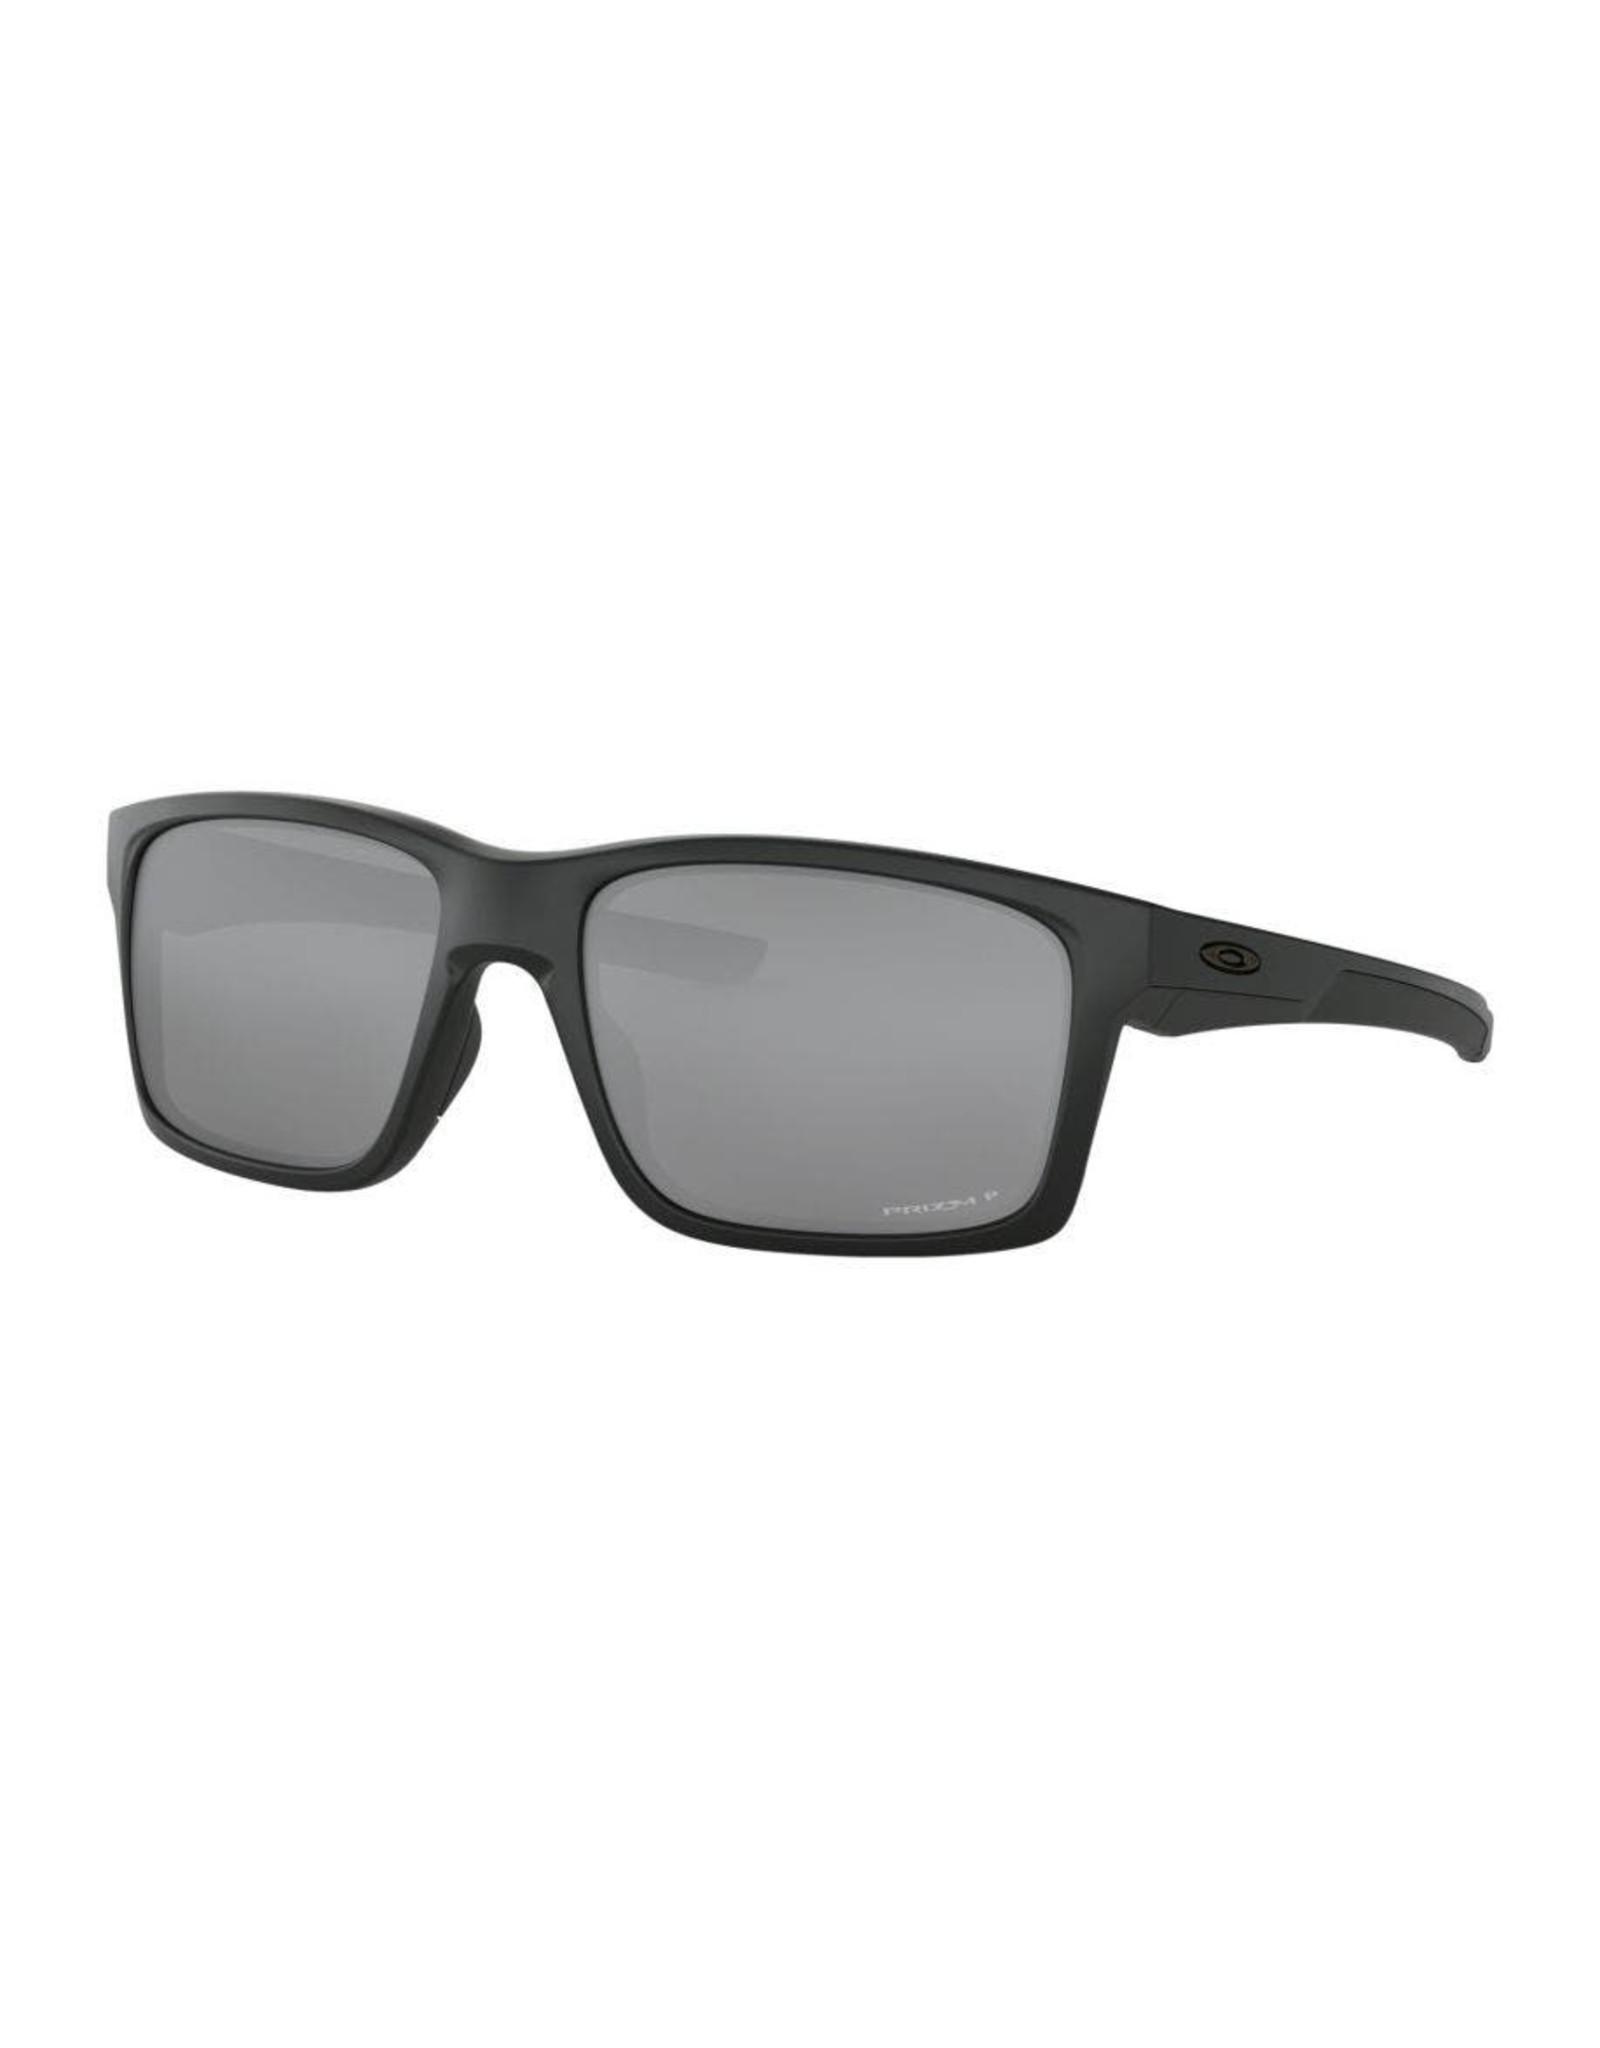 Oakley mens sunglasses MAINLINK matte black w/ prizm black polarized